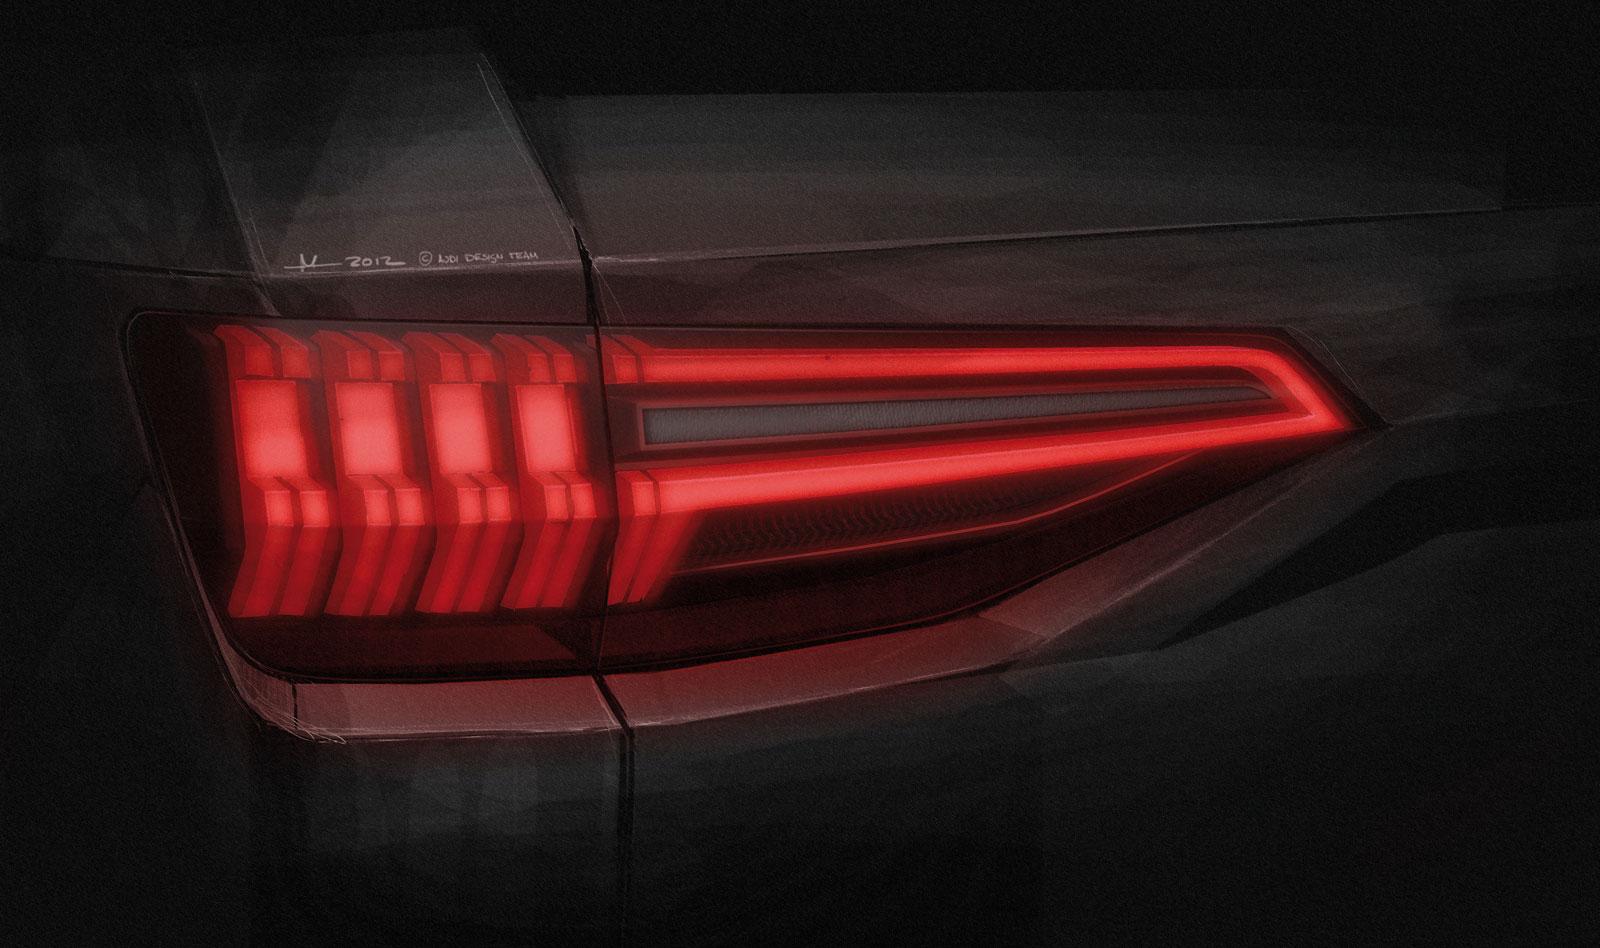 Audi Crosslane Coupe Concept Tail Light Design Sketch Car Body Design